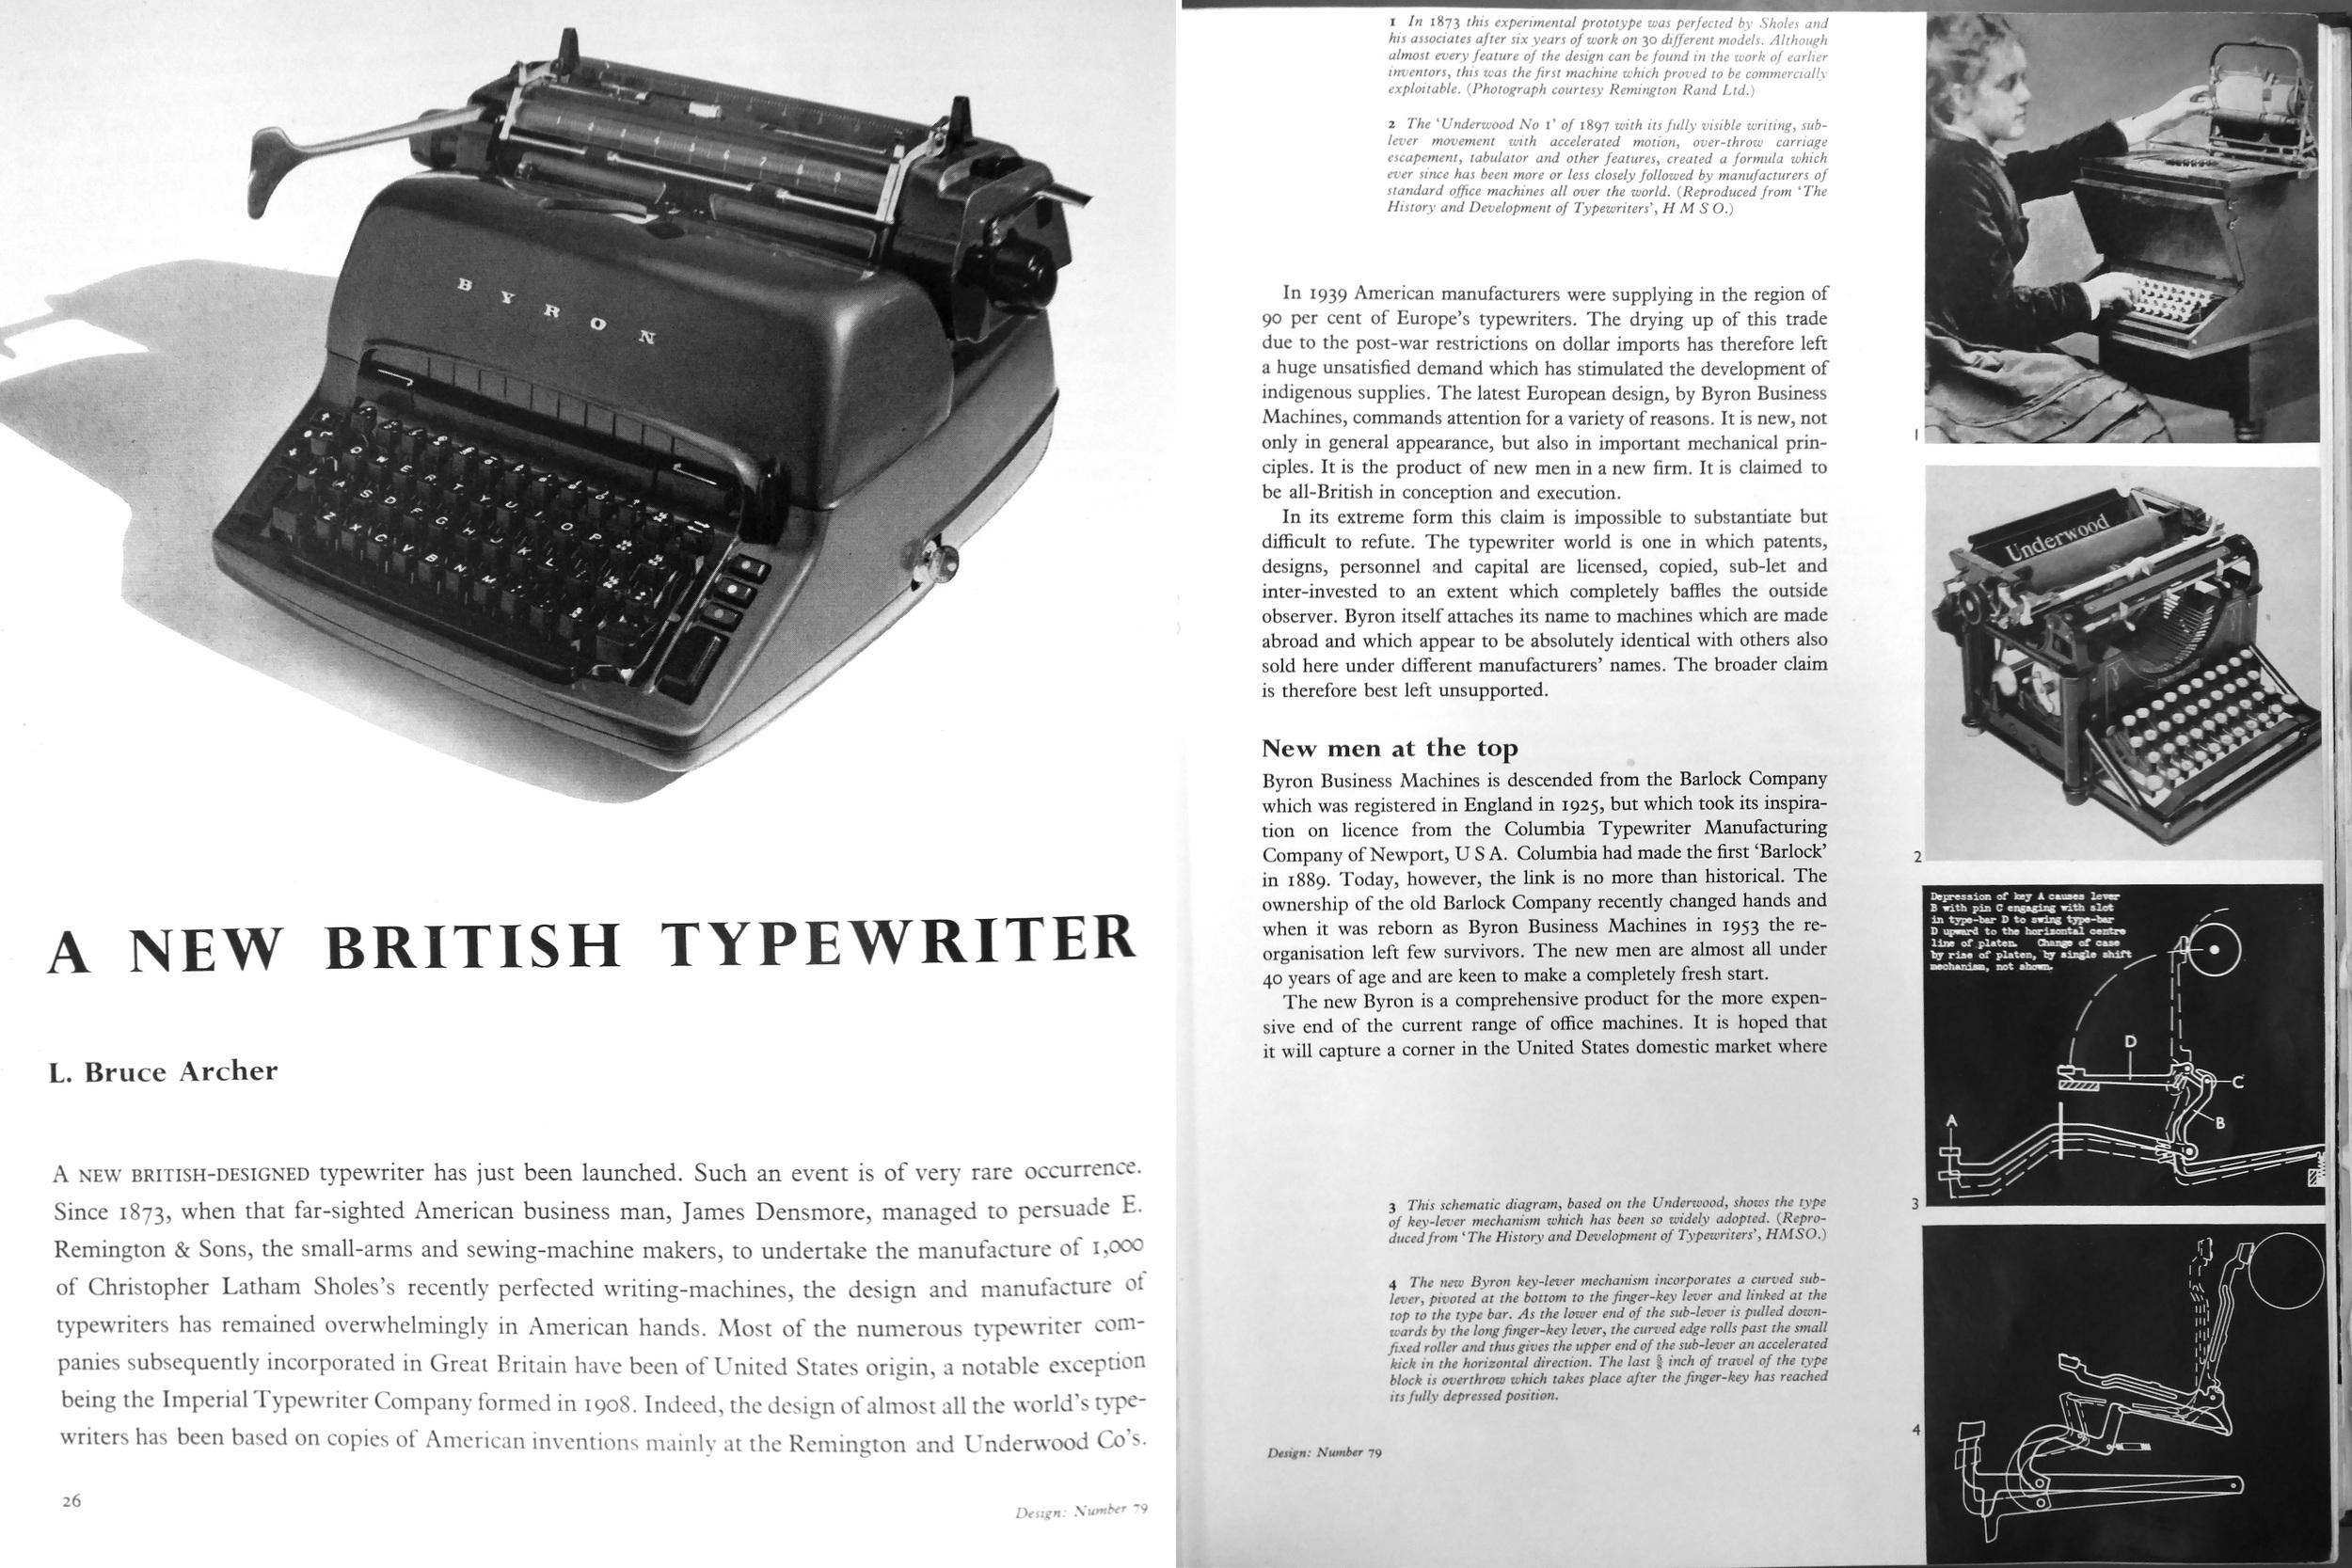 DDR_A-New-British-Typewriter_July_1955.jpg